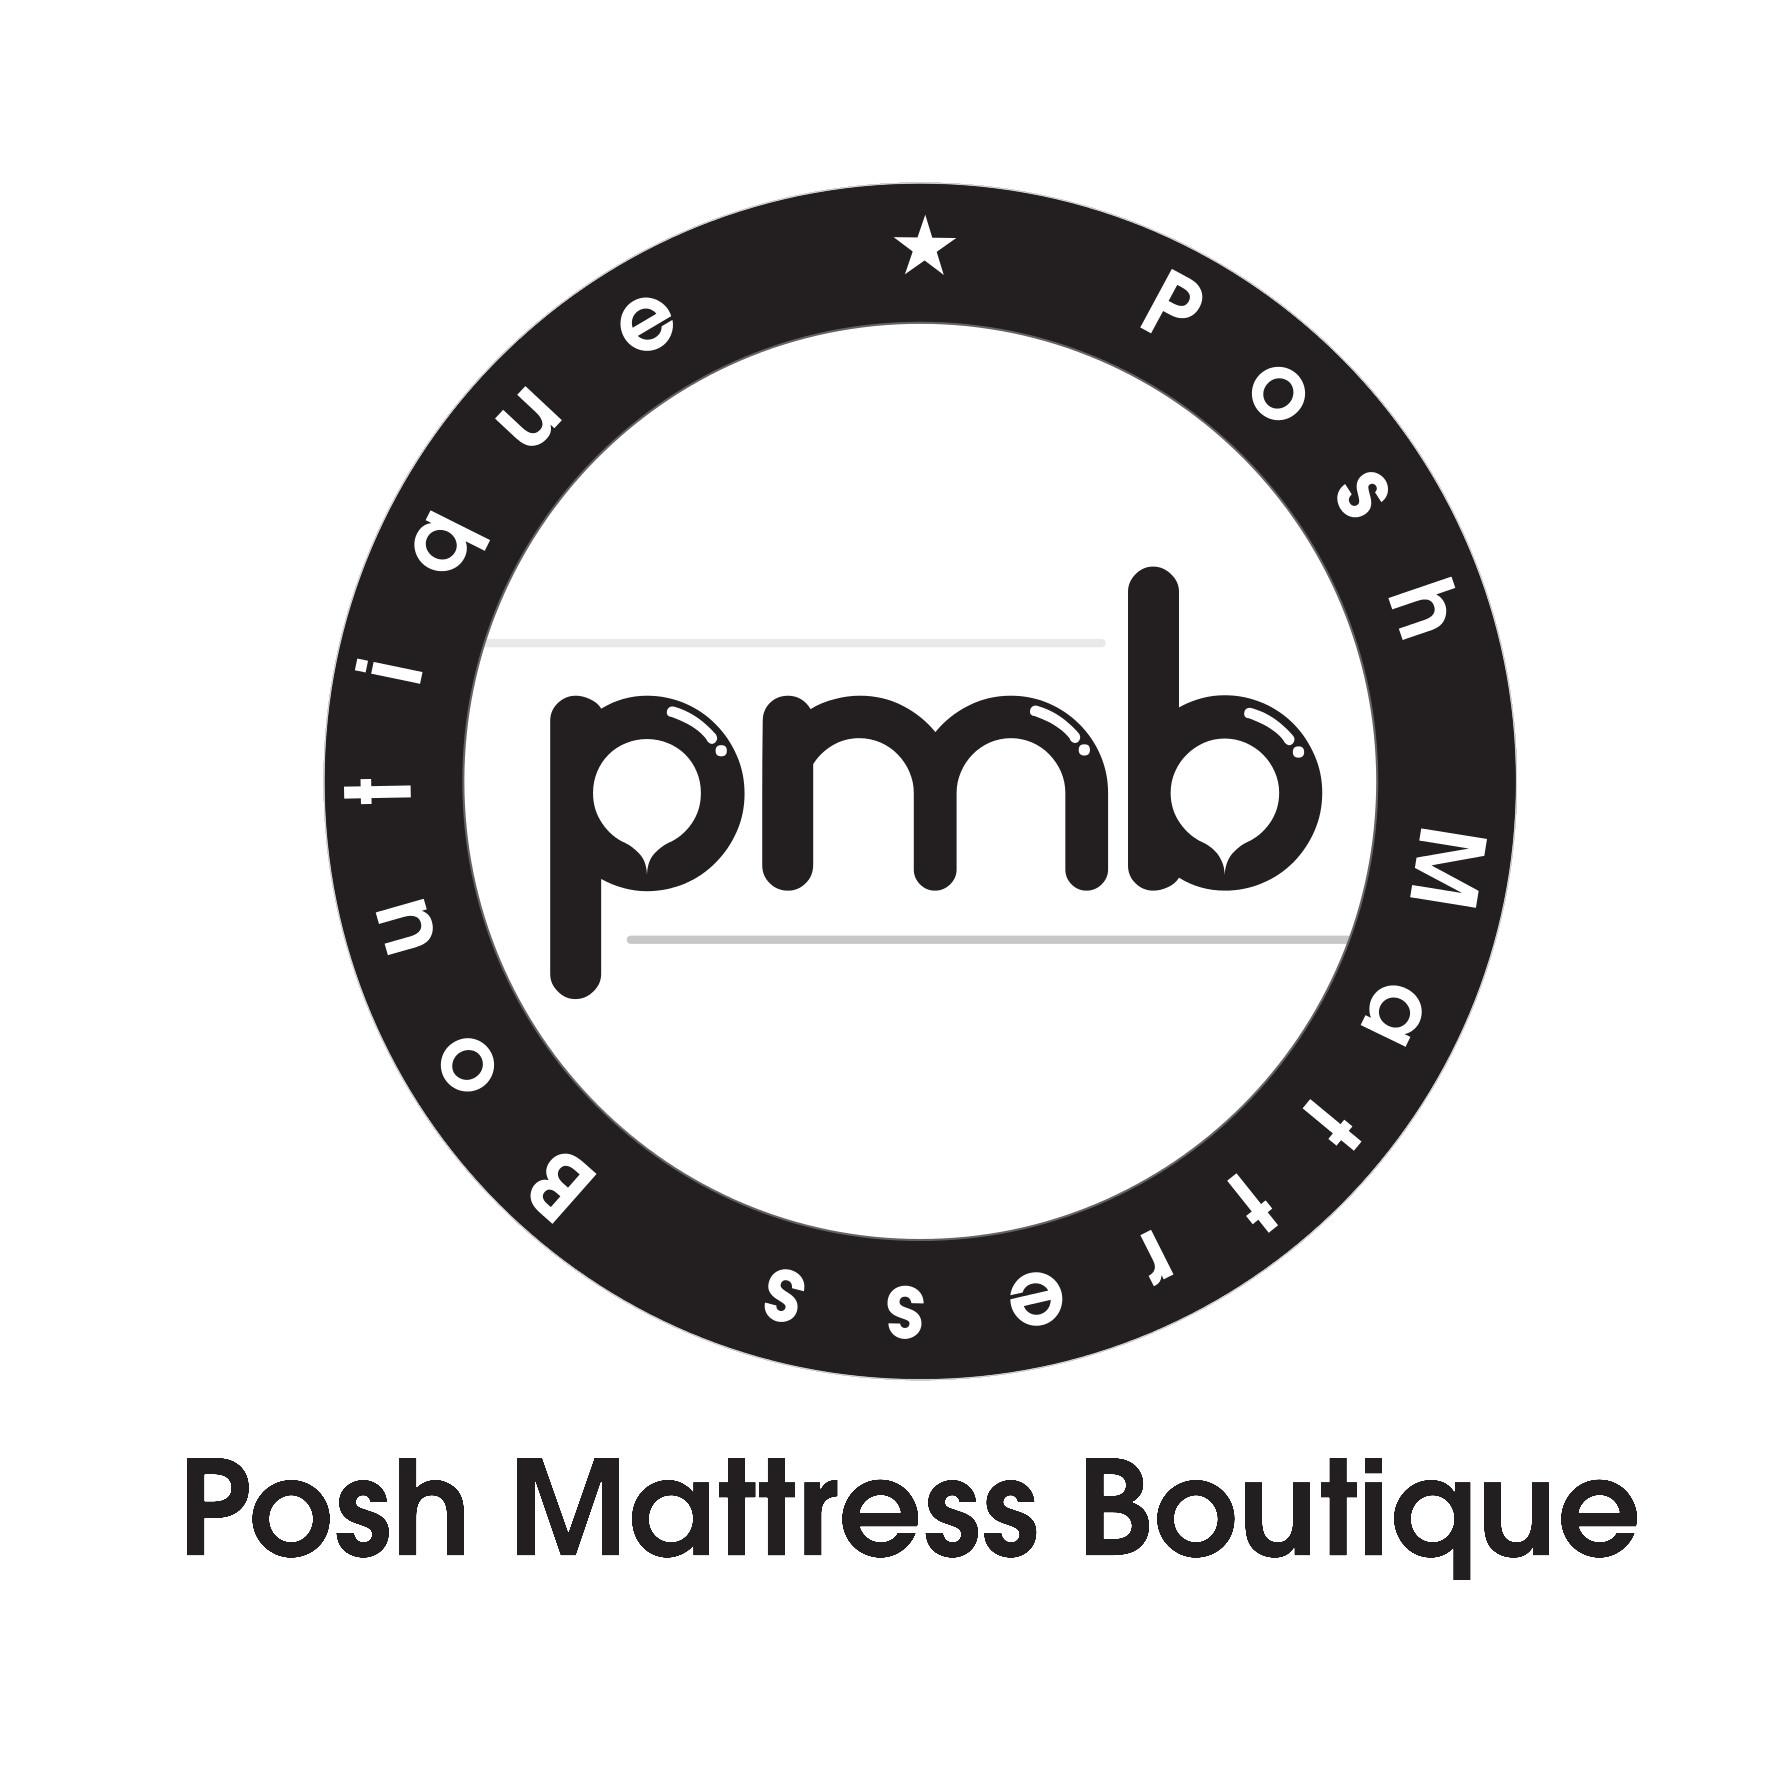 Posh Mattress